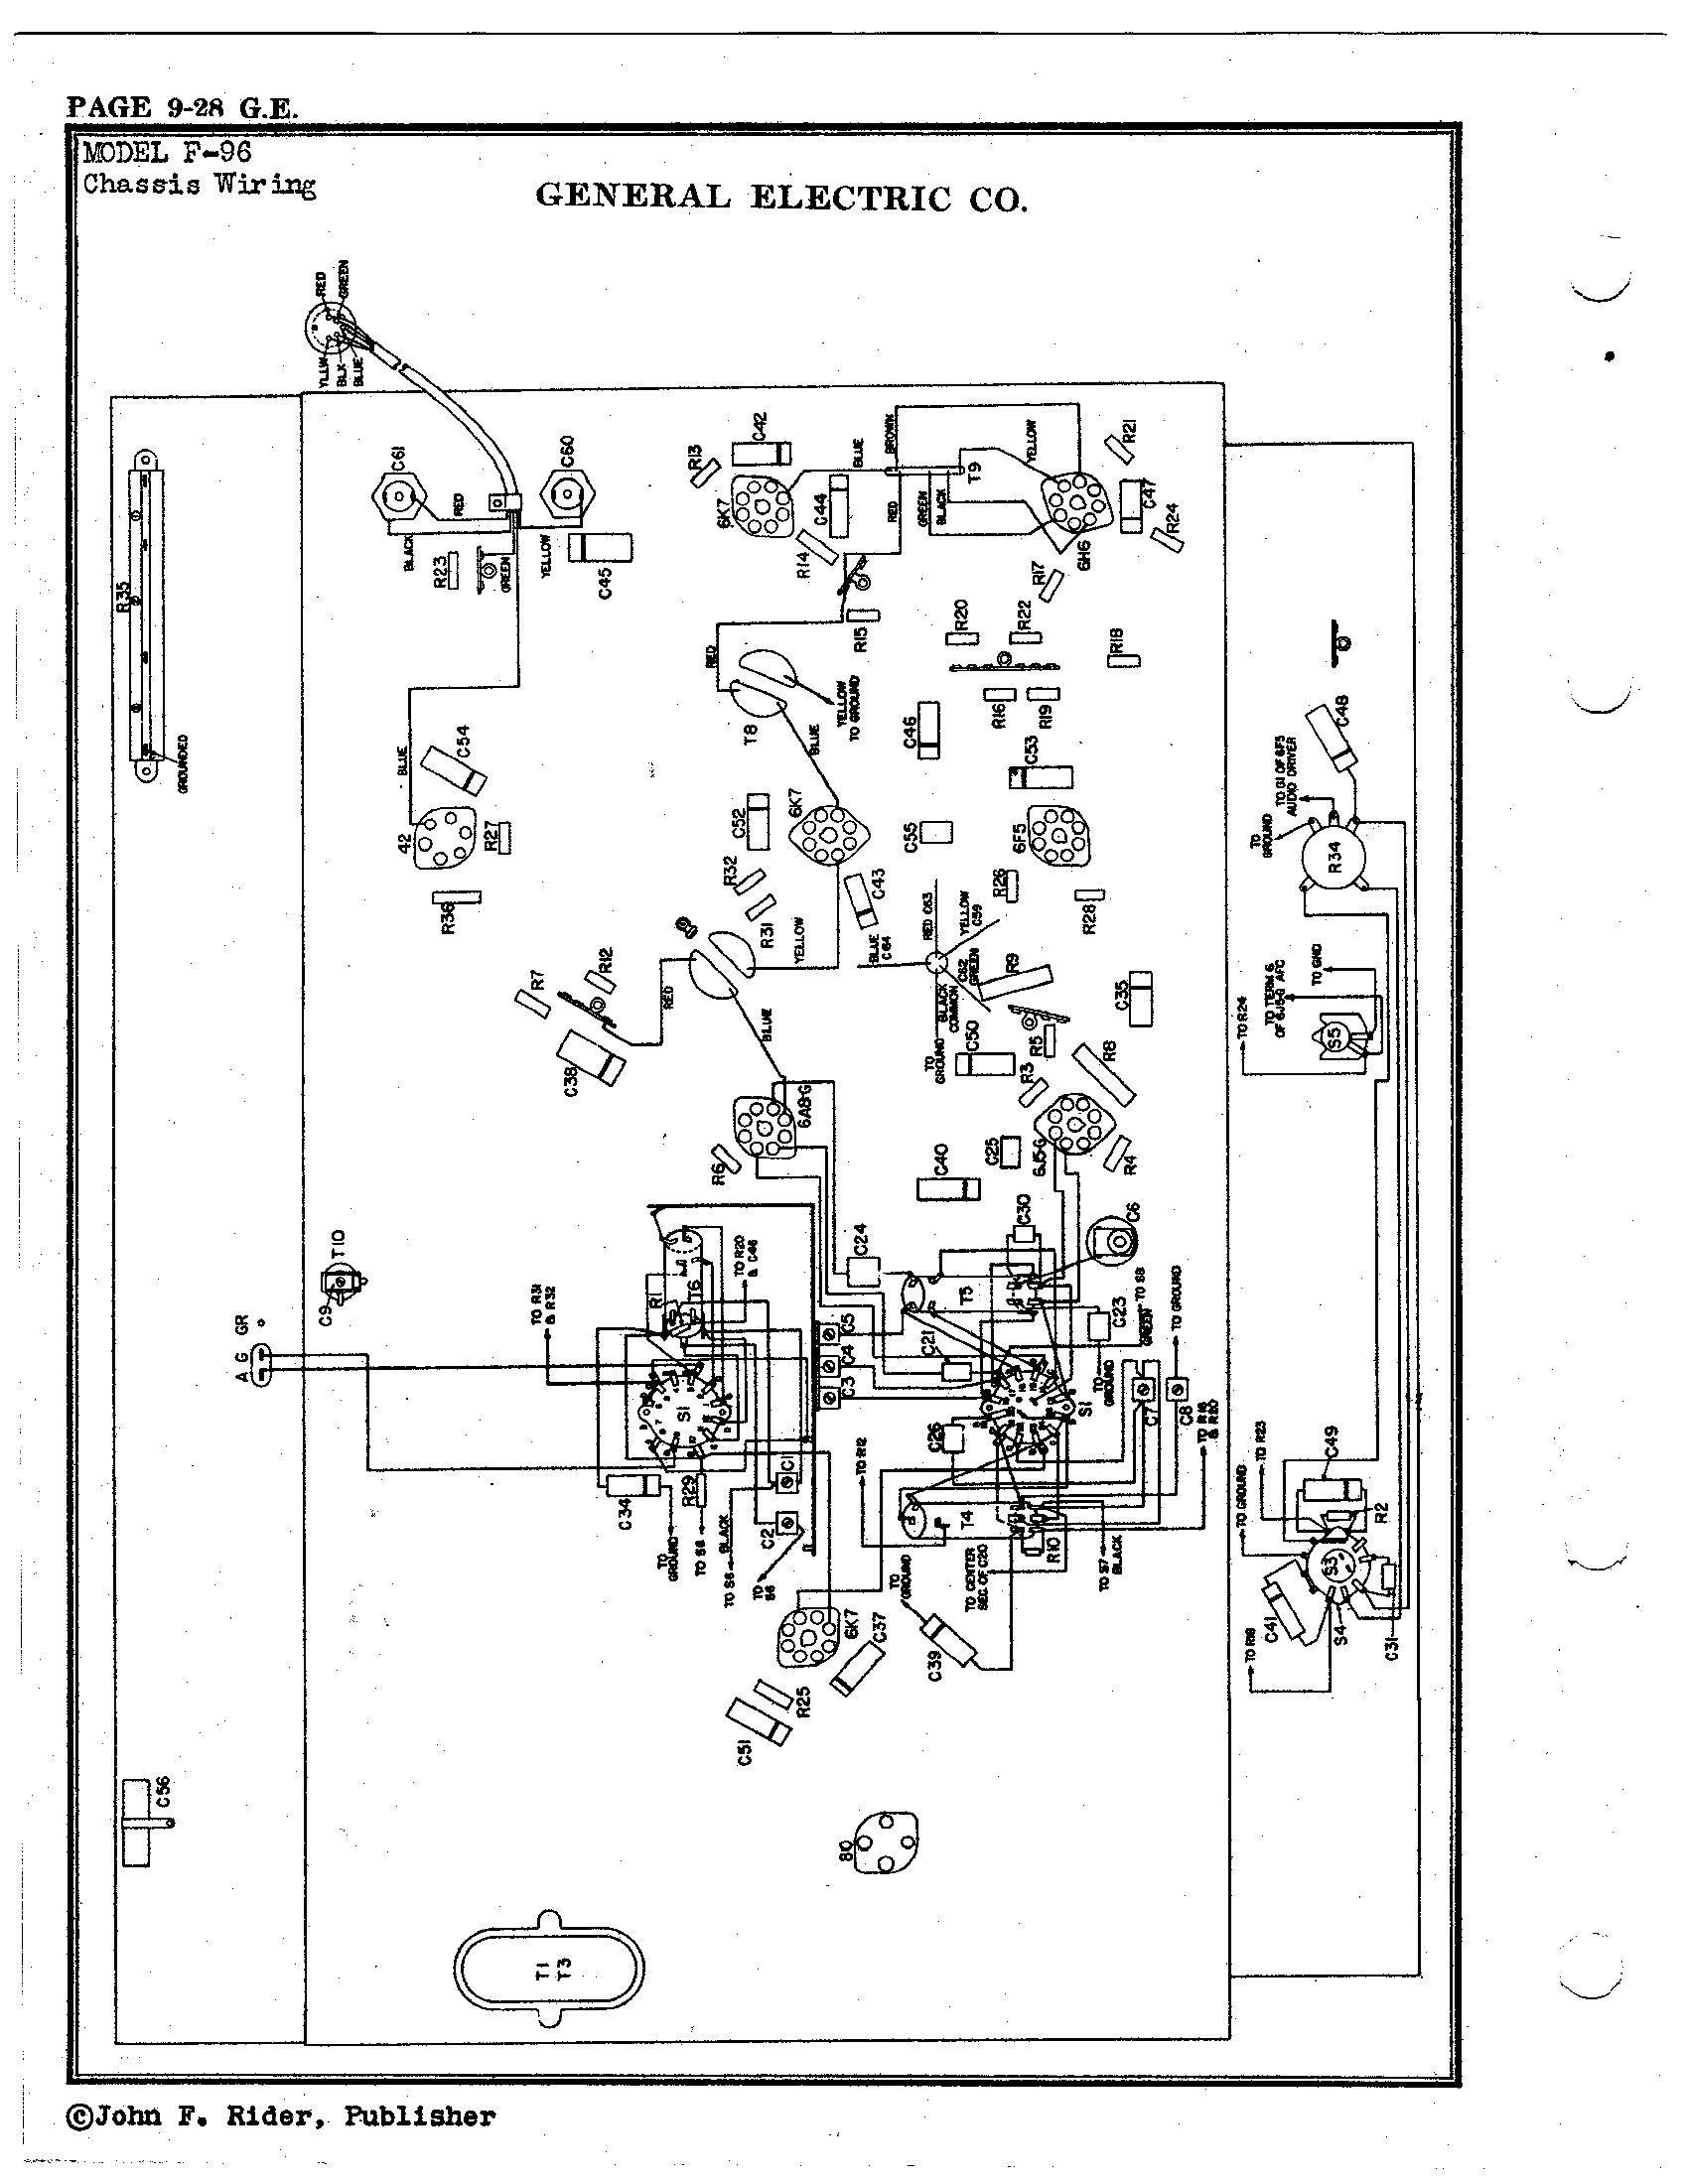 Ge Radio Schematic - Wiring Diagrams List